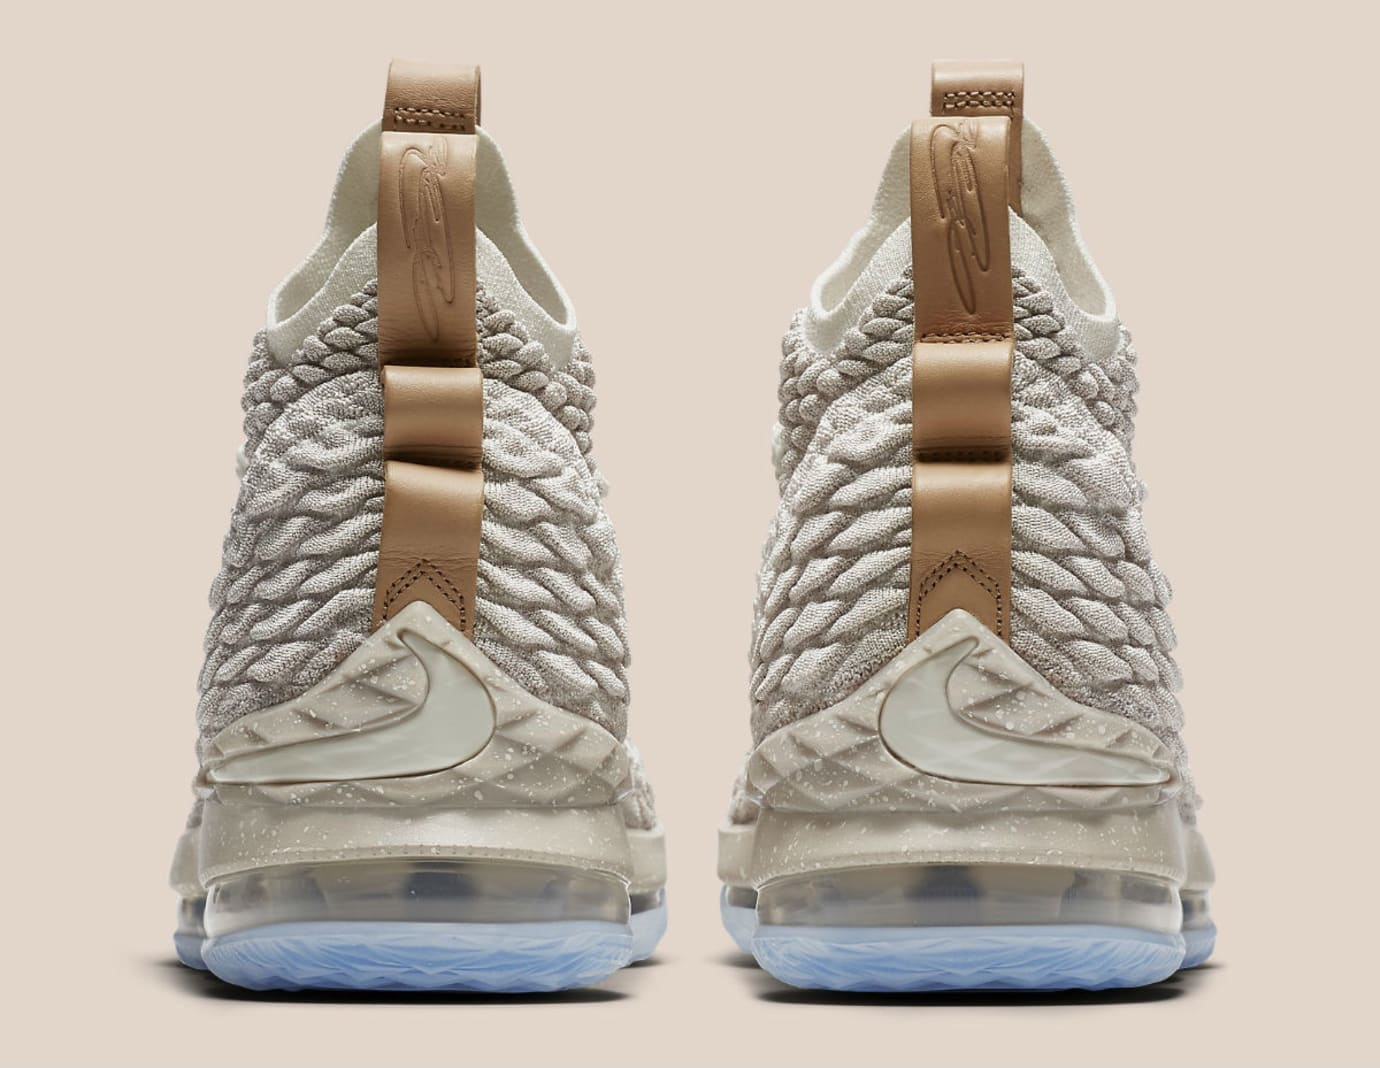 the latest 213d9 3469b Ghost' Nike LeBron 15 String/Vachetta Tan-Sail 897649-200 ...